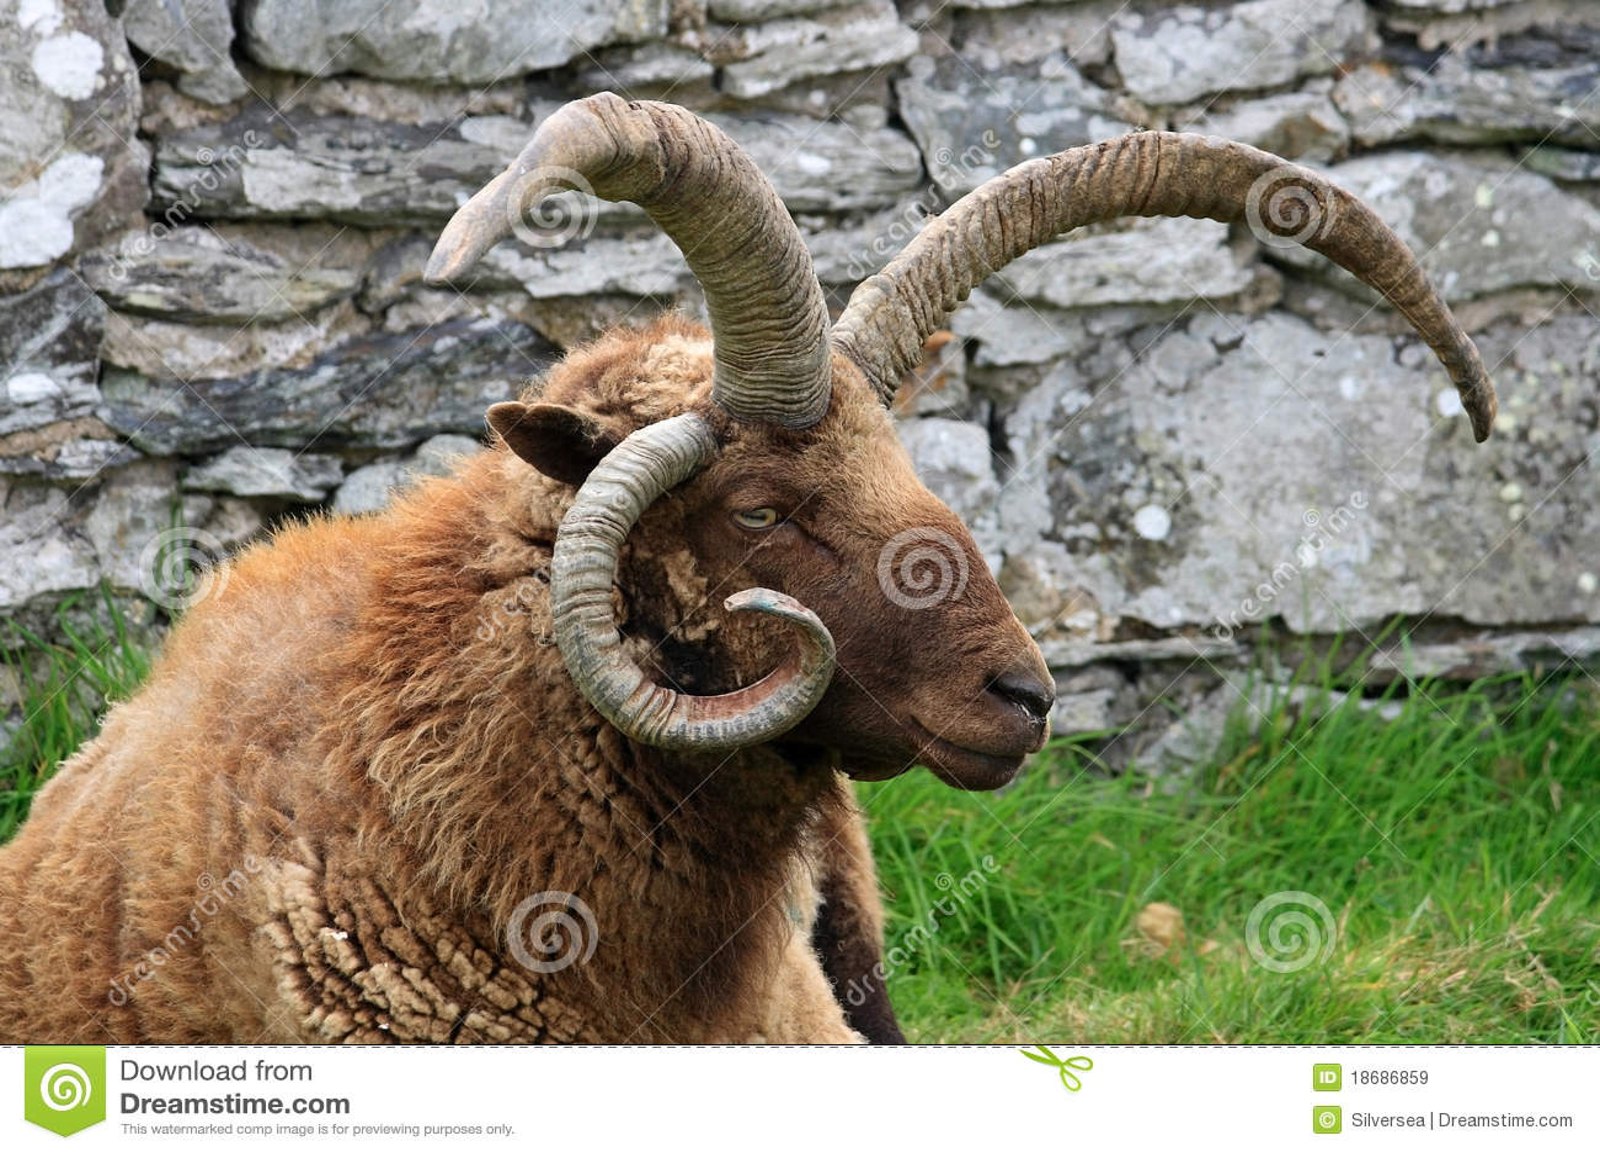 Loaghtan RAM